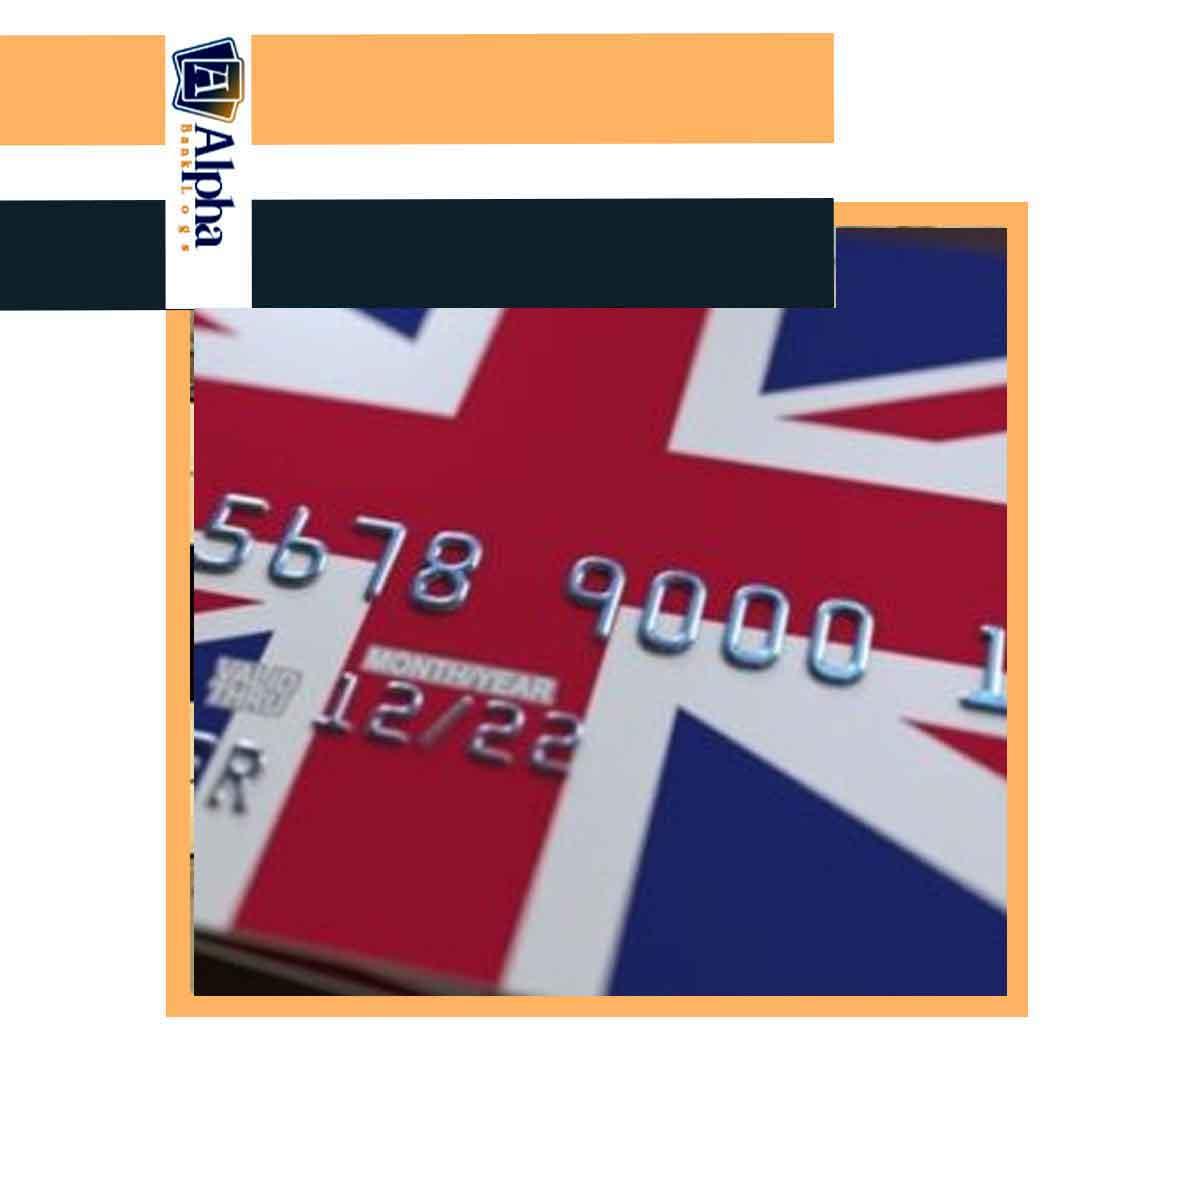 UK CC Dump + atm PIN x 10 HIGH BALANCE